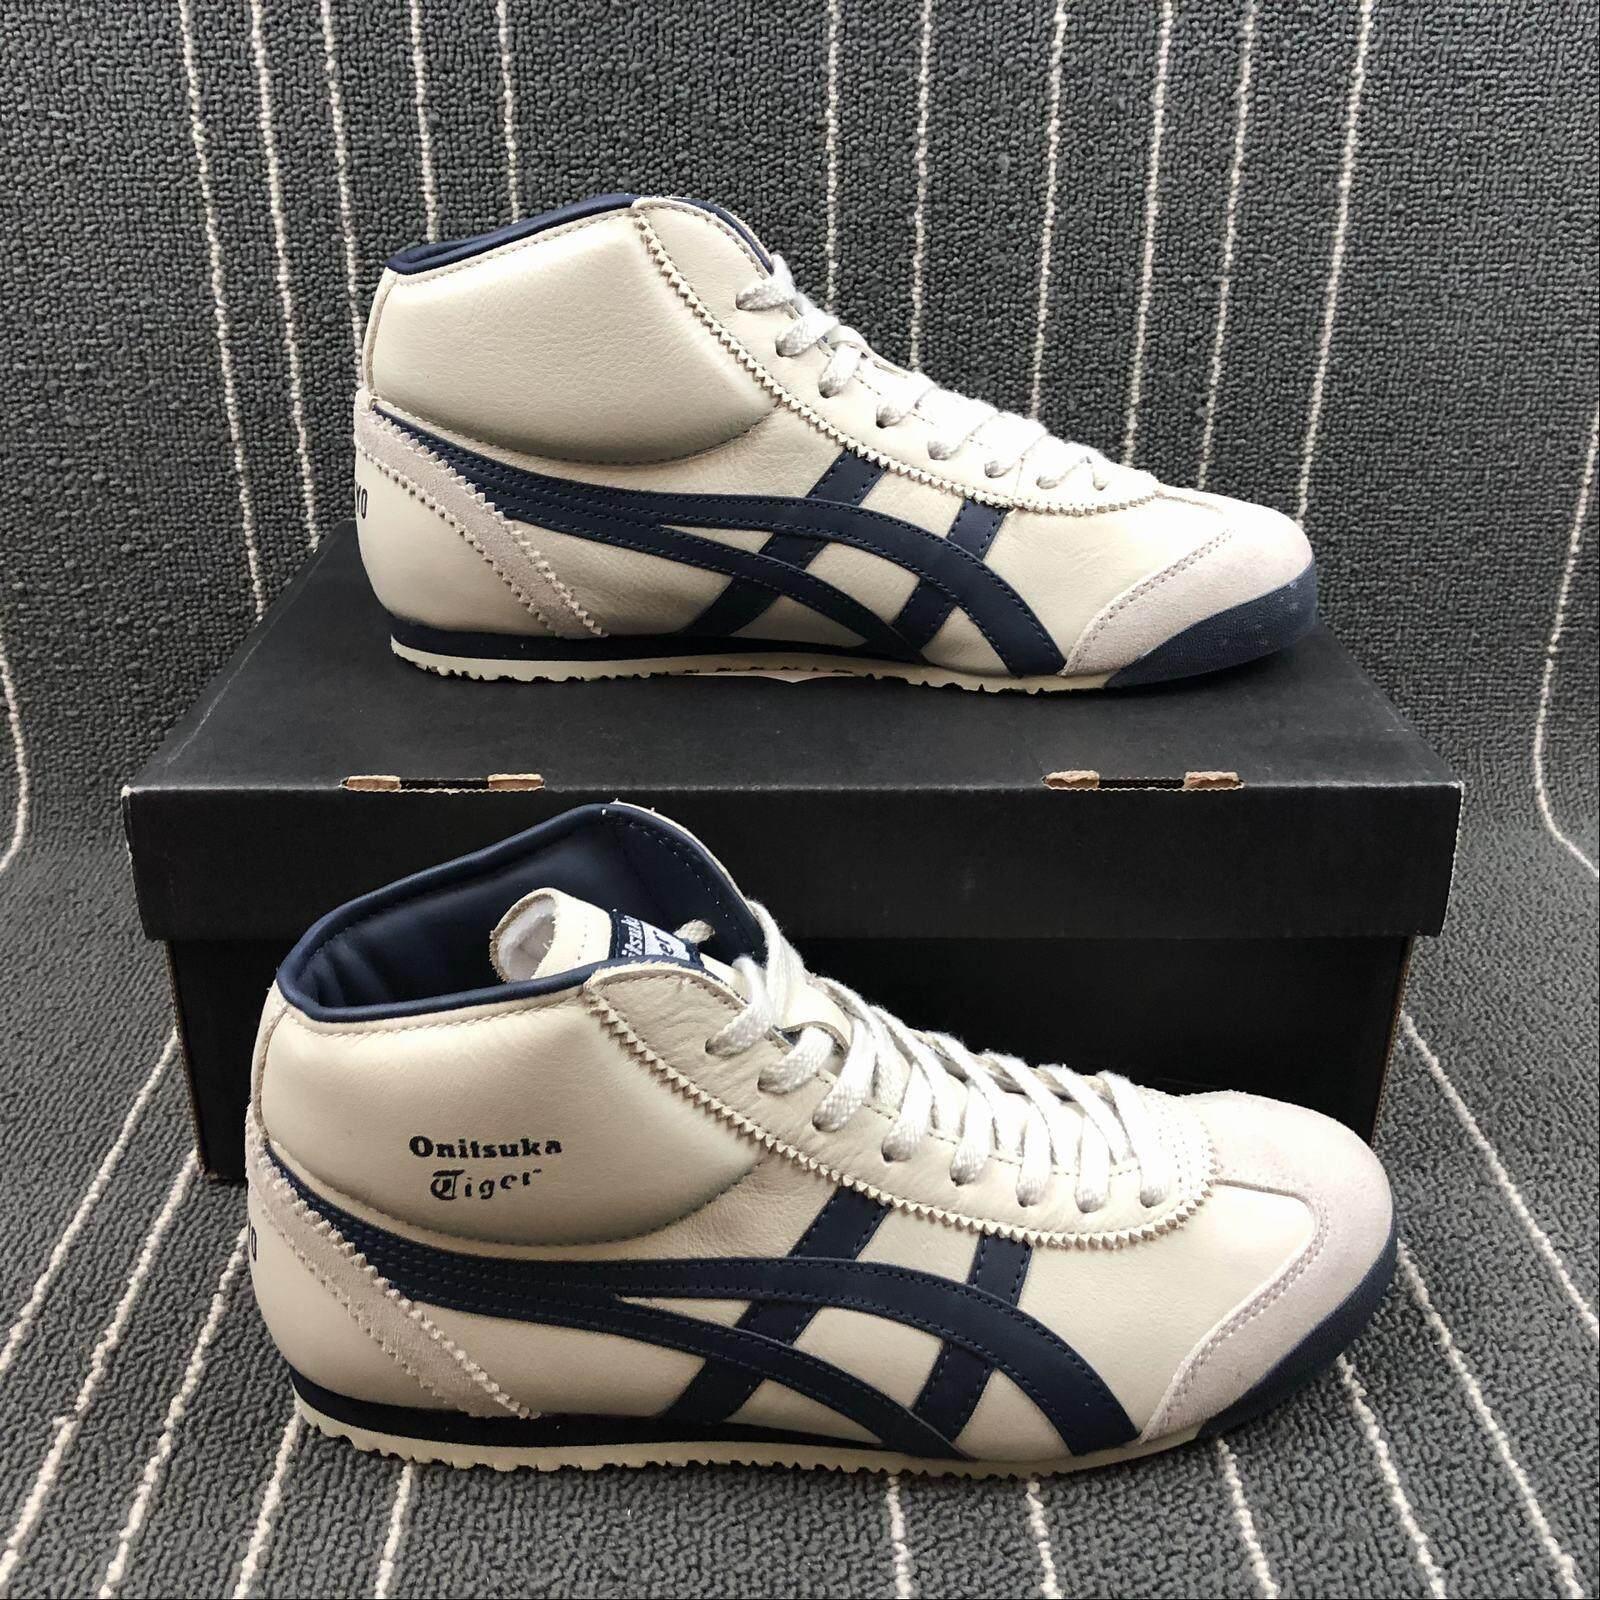 c2b576698c07b Asics Onitsuka tiger MEXICO 66 THL328-1659 Men s Women s Sport Fashion  Running Shoes Sneakers